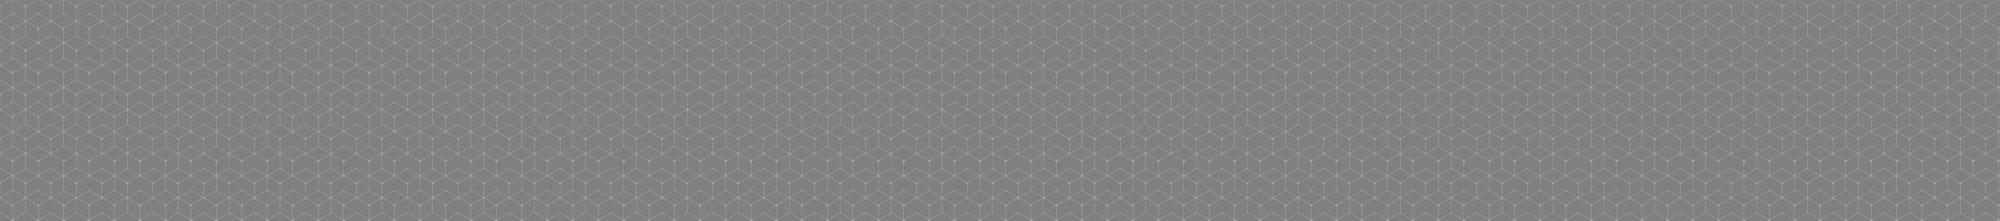 New-Pattern 2.jpg